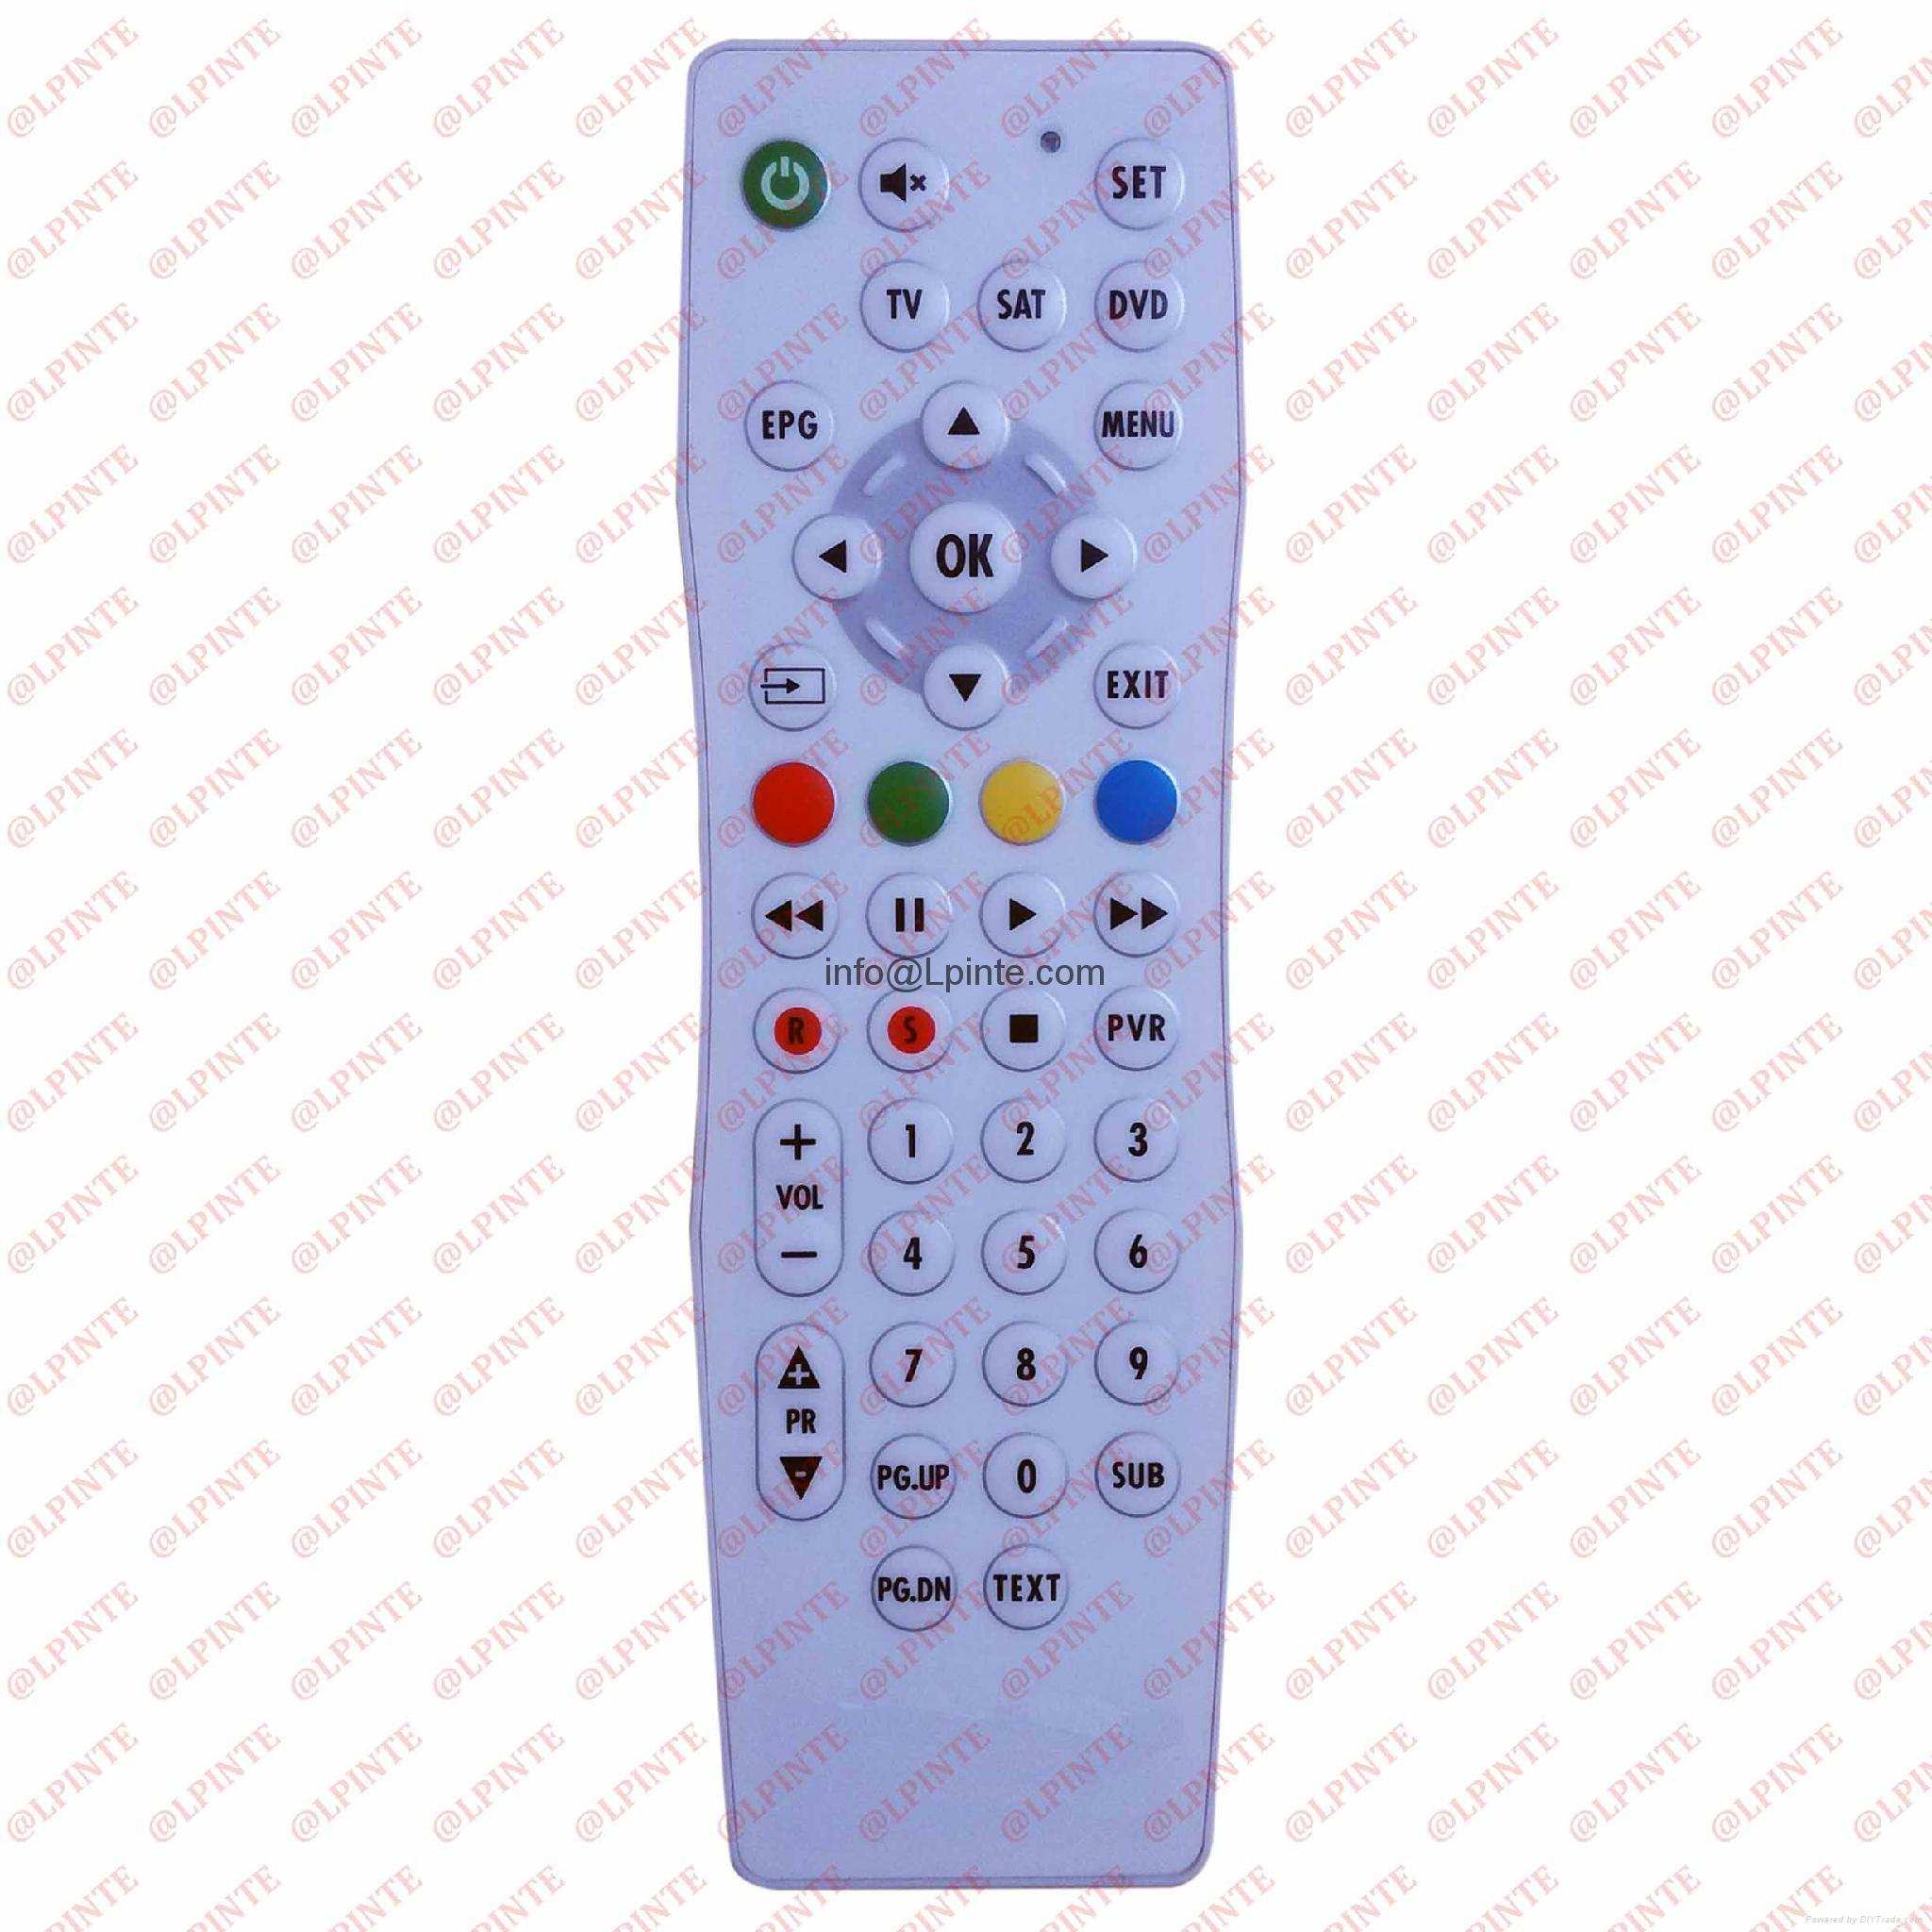 TVS0048504 tv